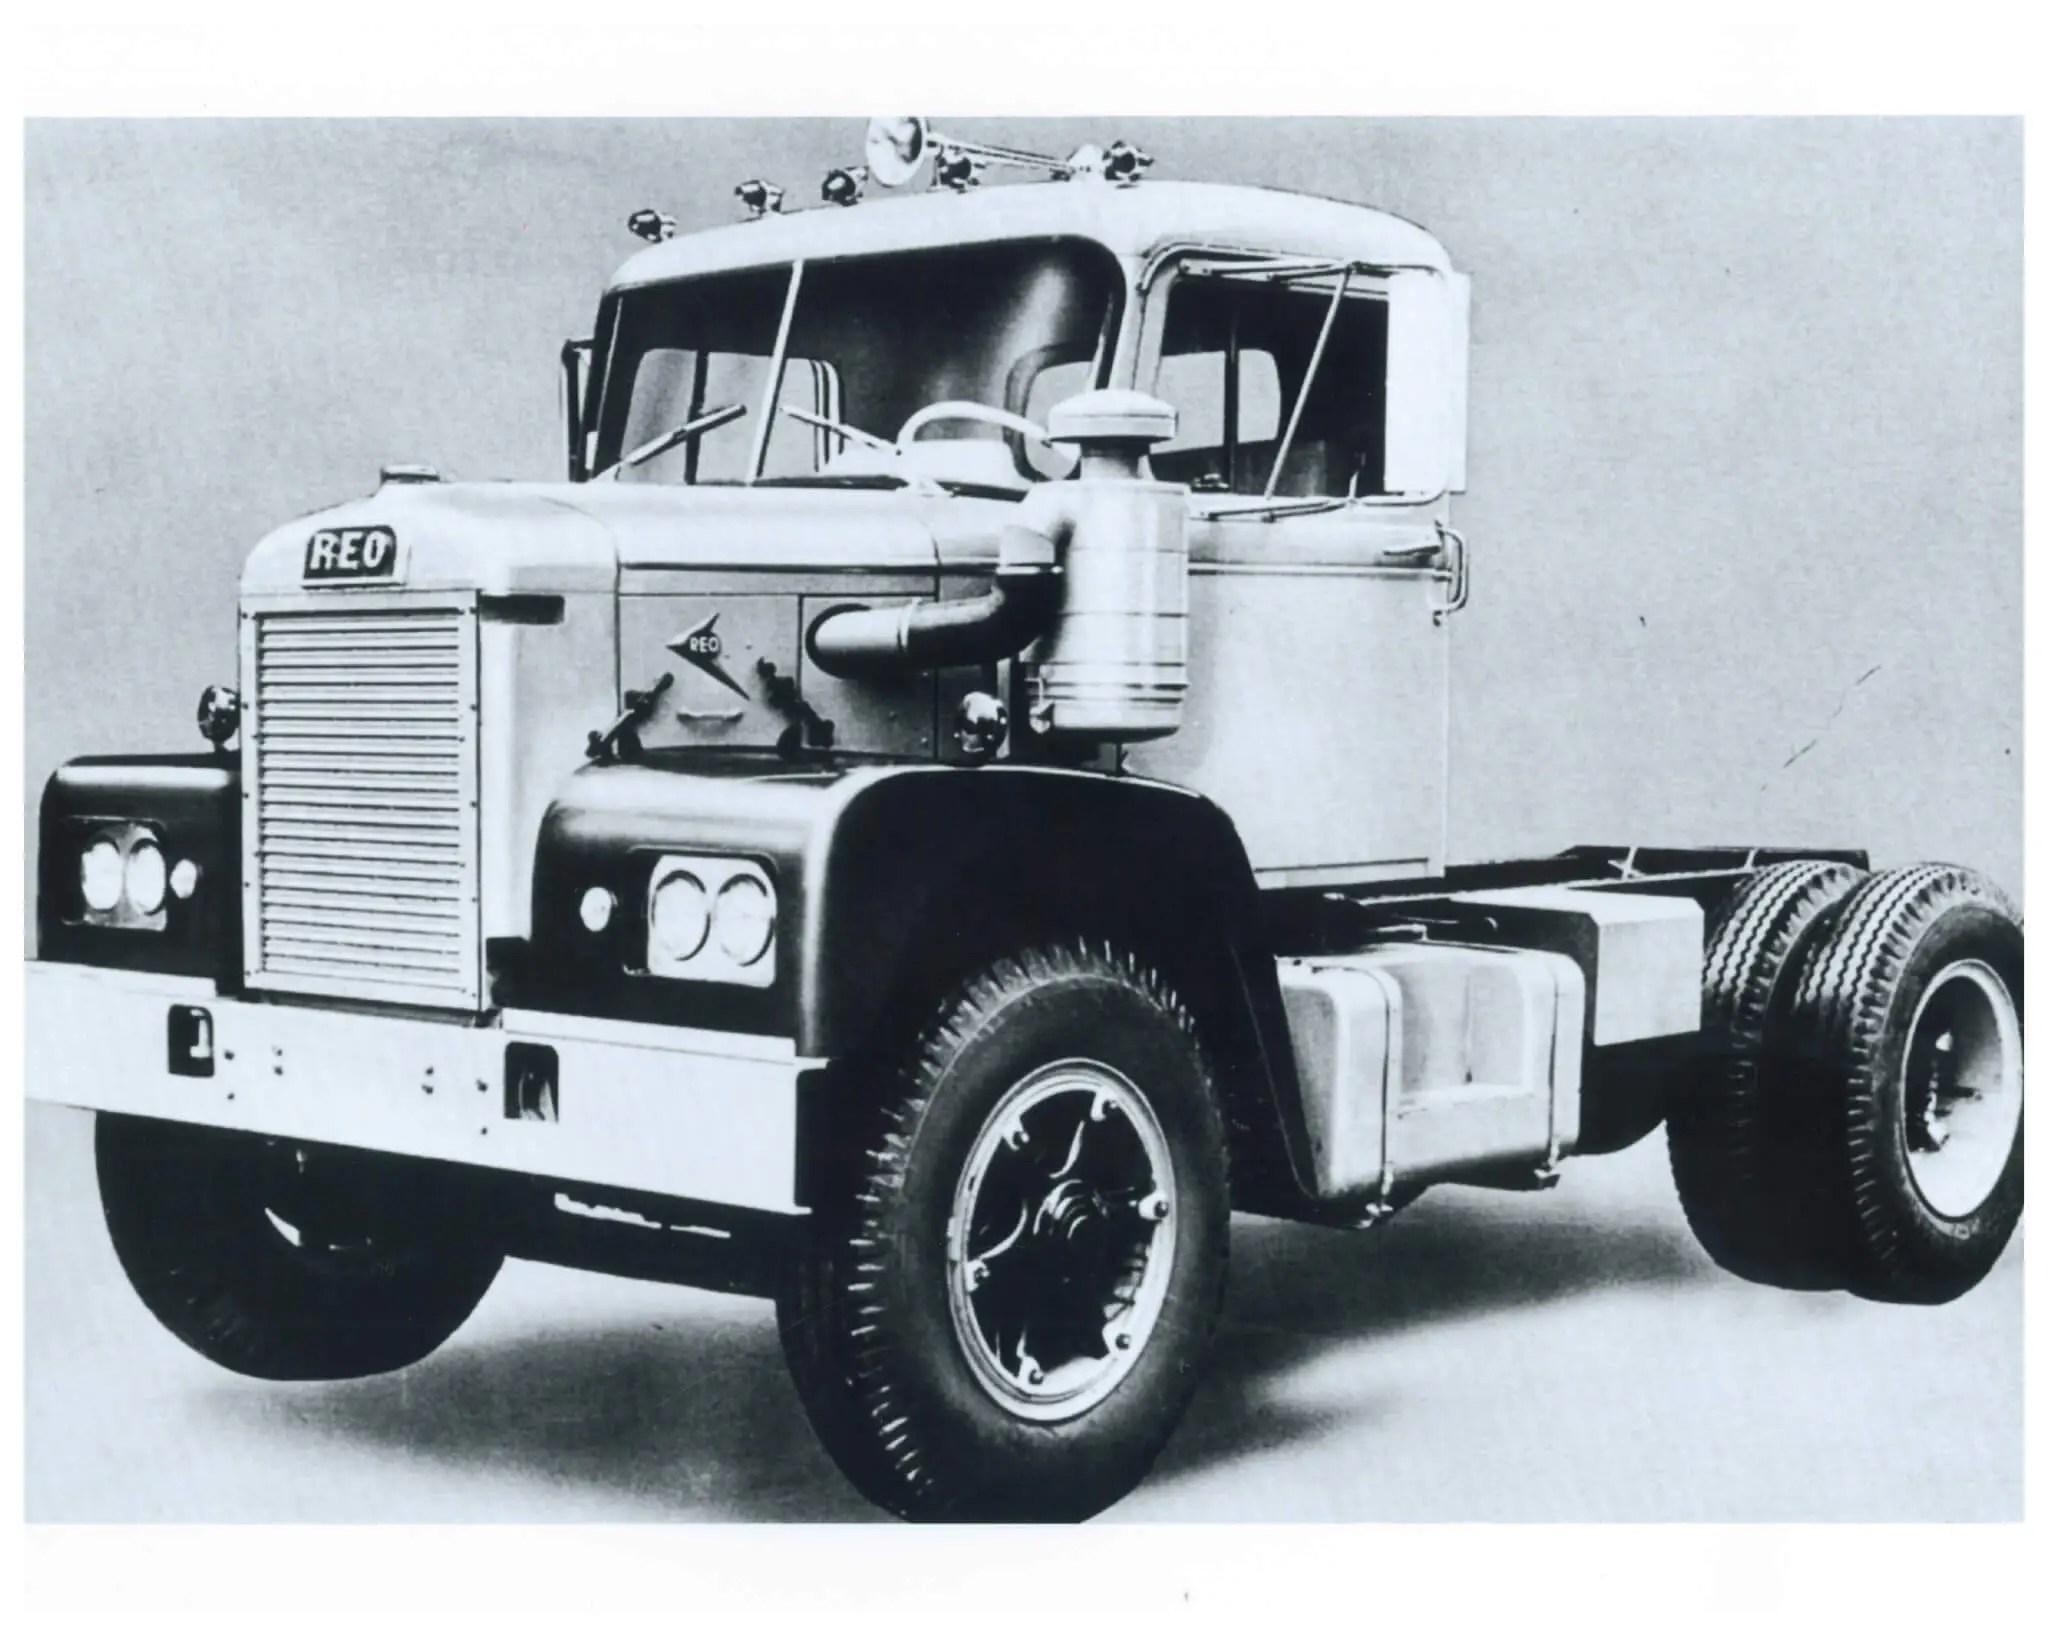 REO, World's Toughest Truck